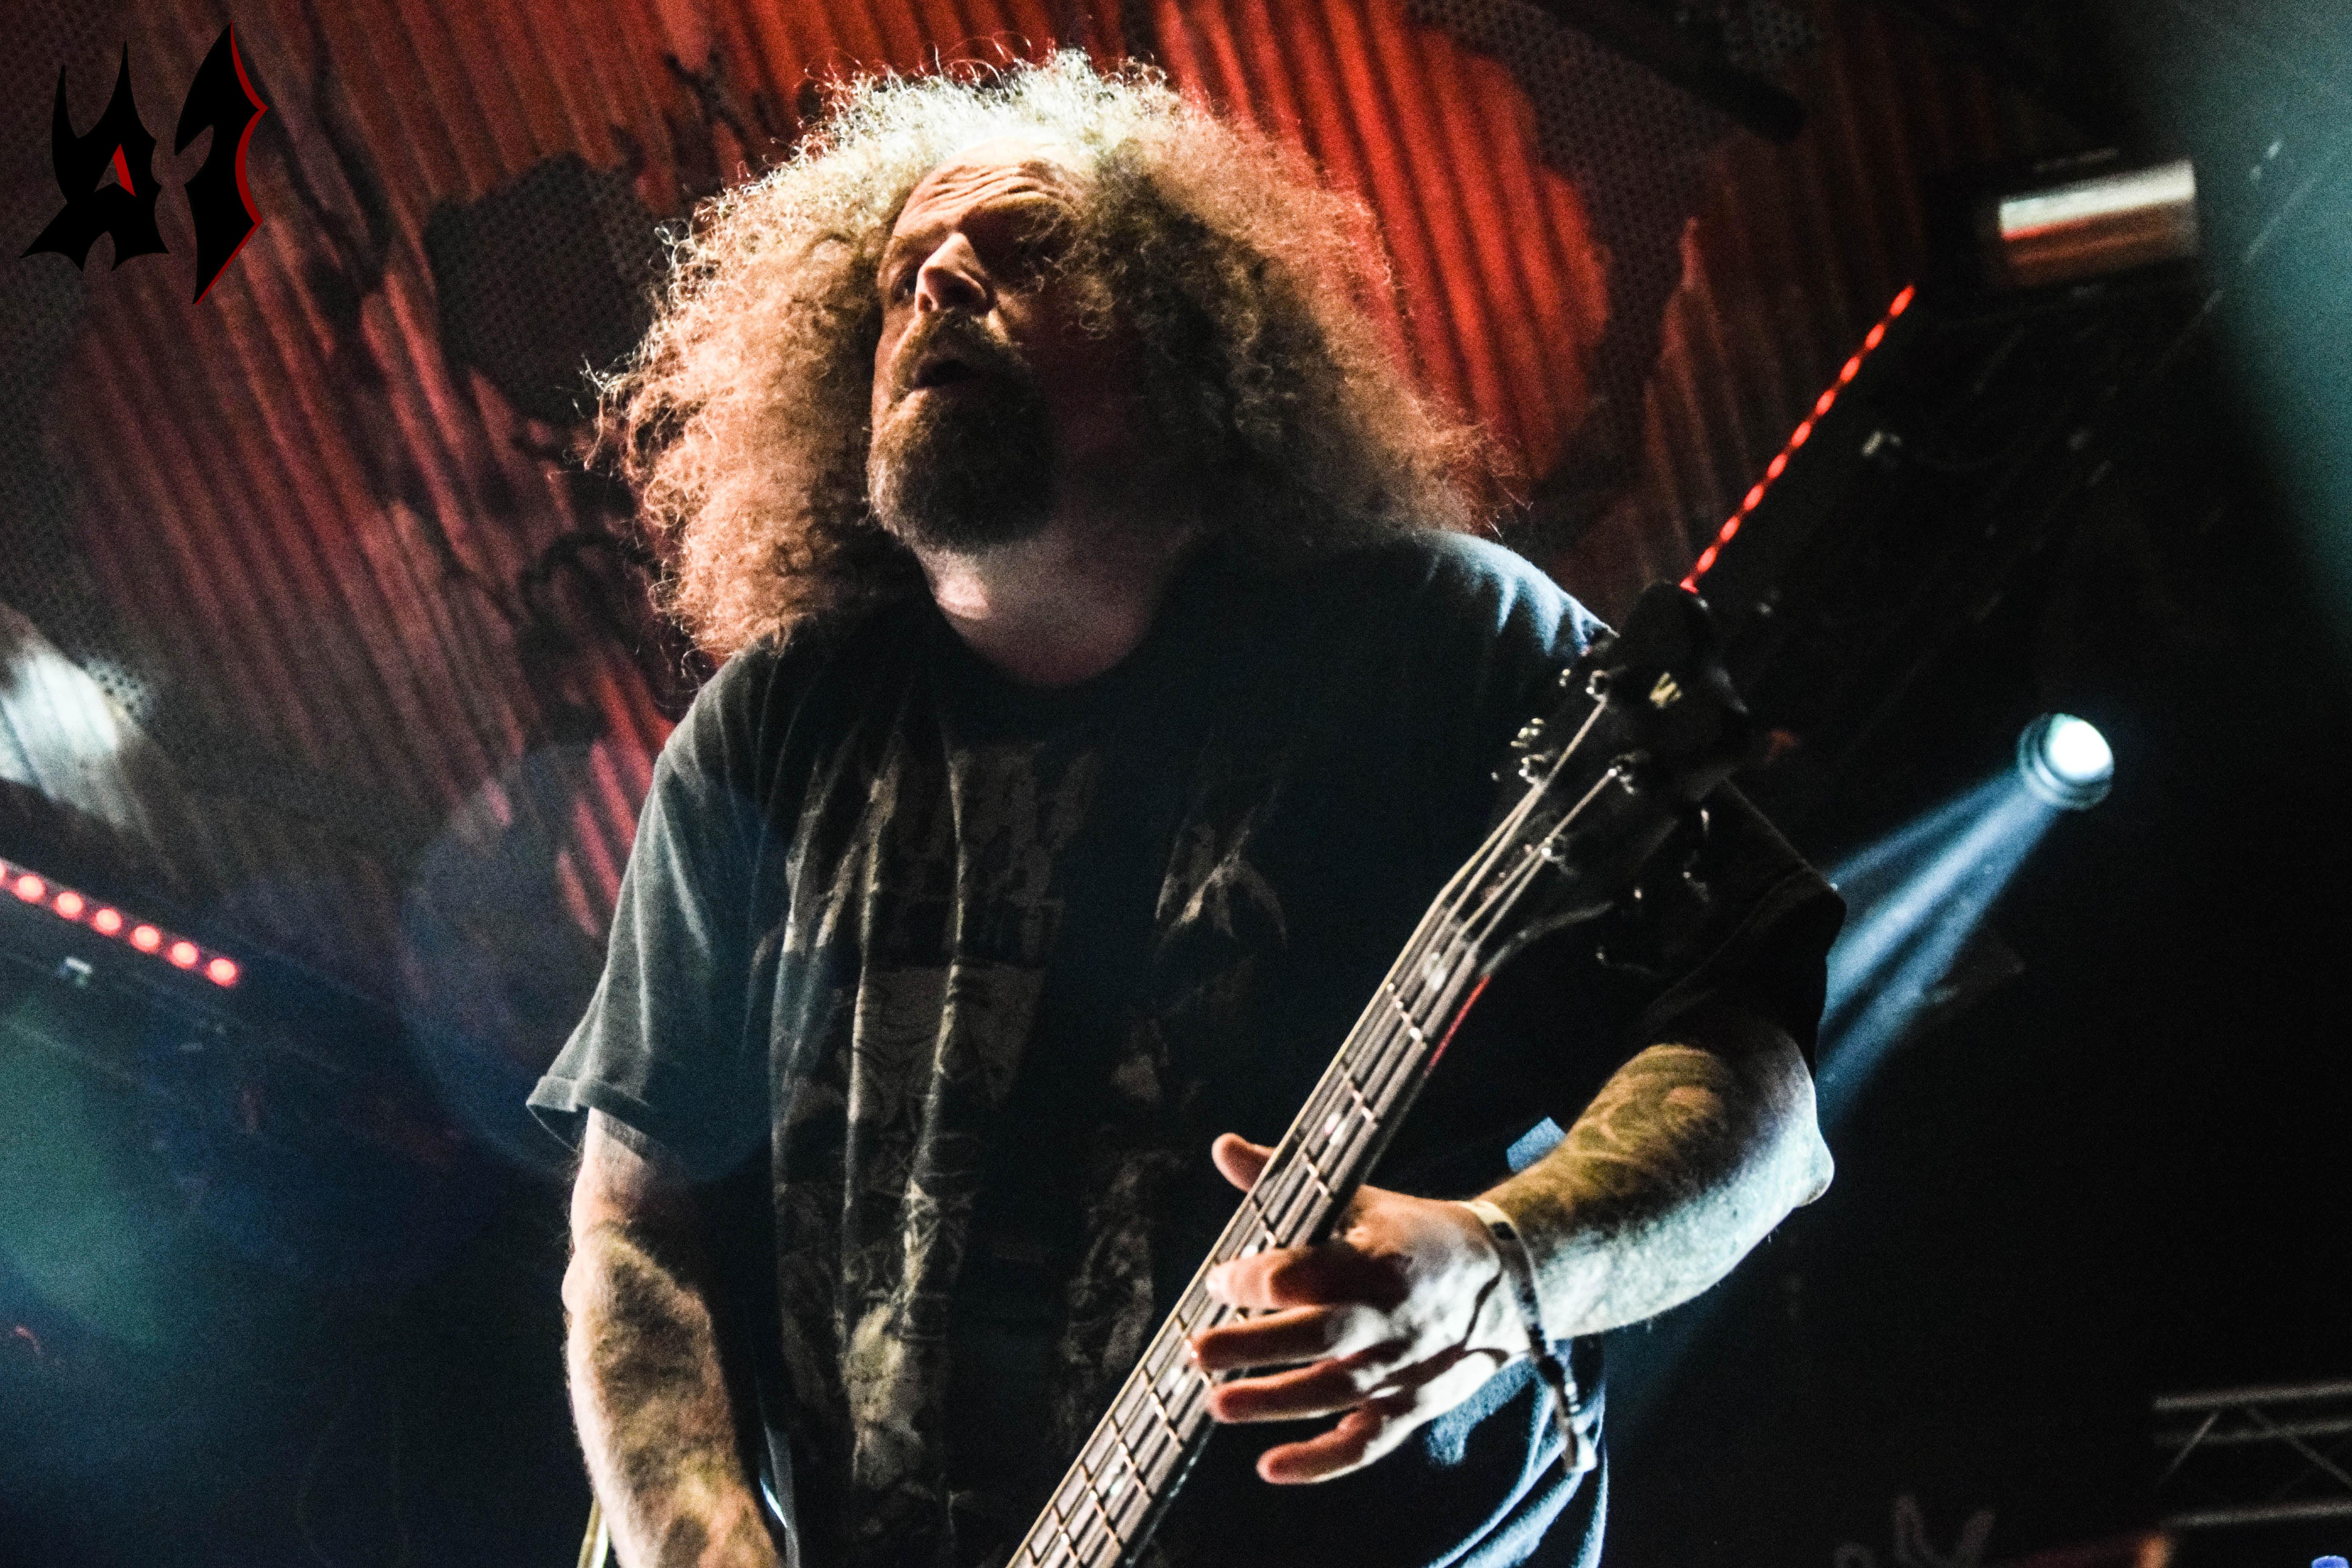 Hellfest - Day 1 - Napalm Death 20